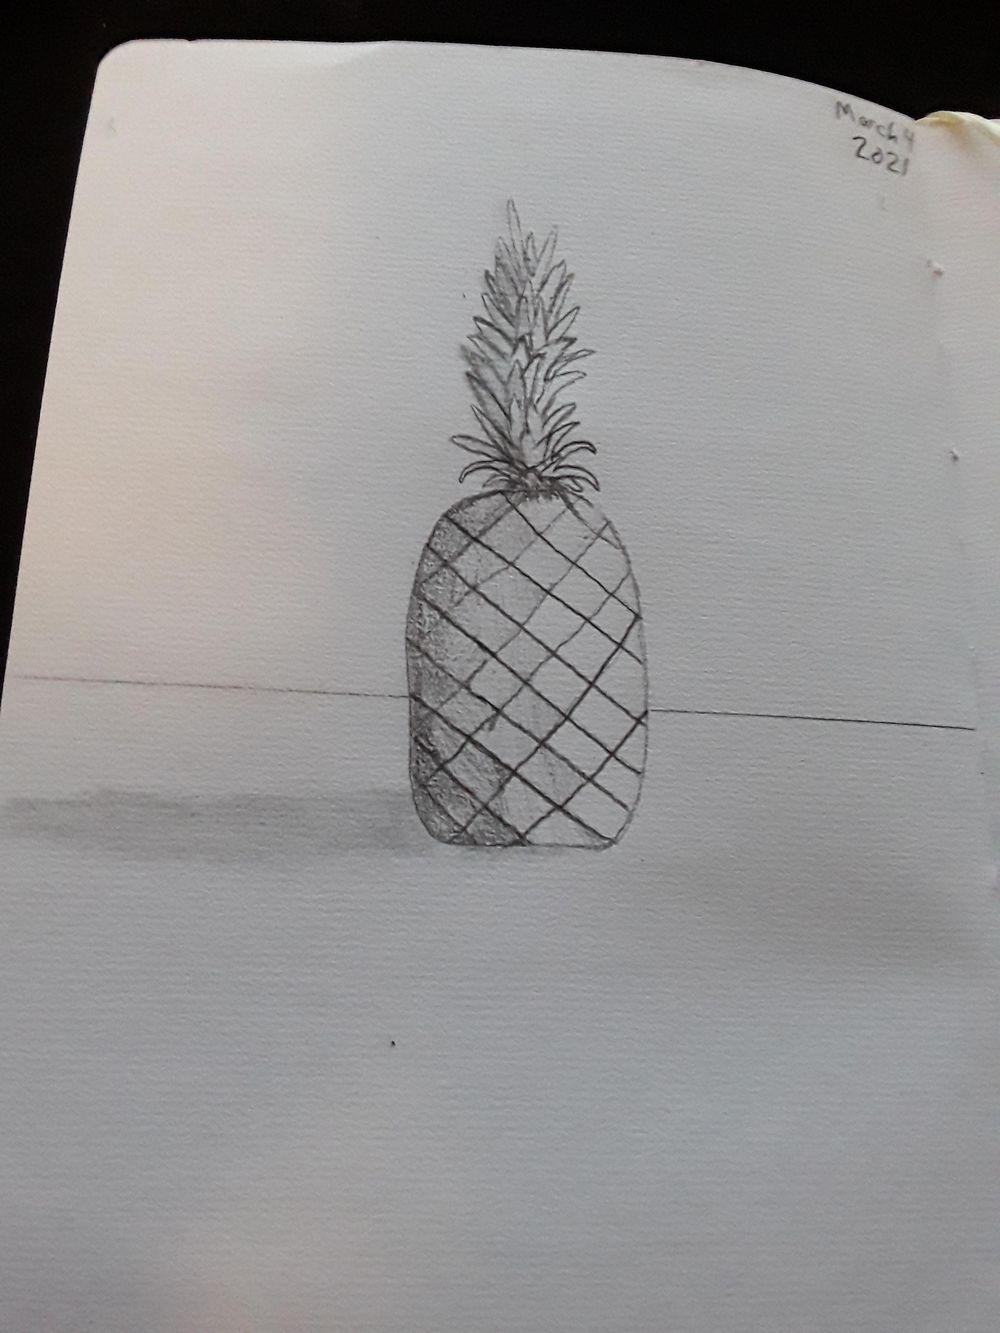 pencil drawing- basics - image 8 - student project